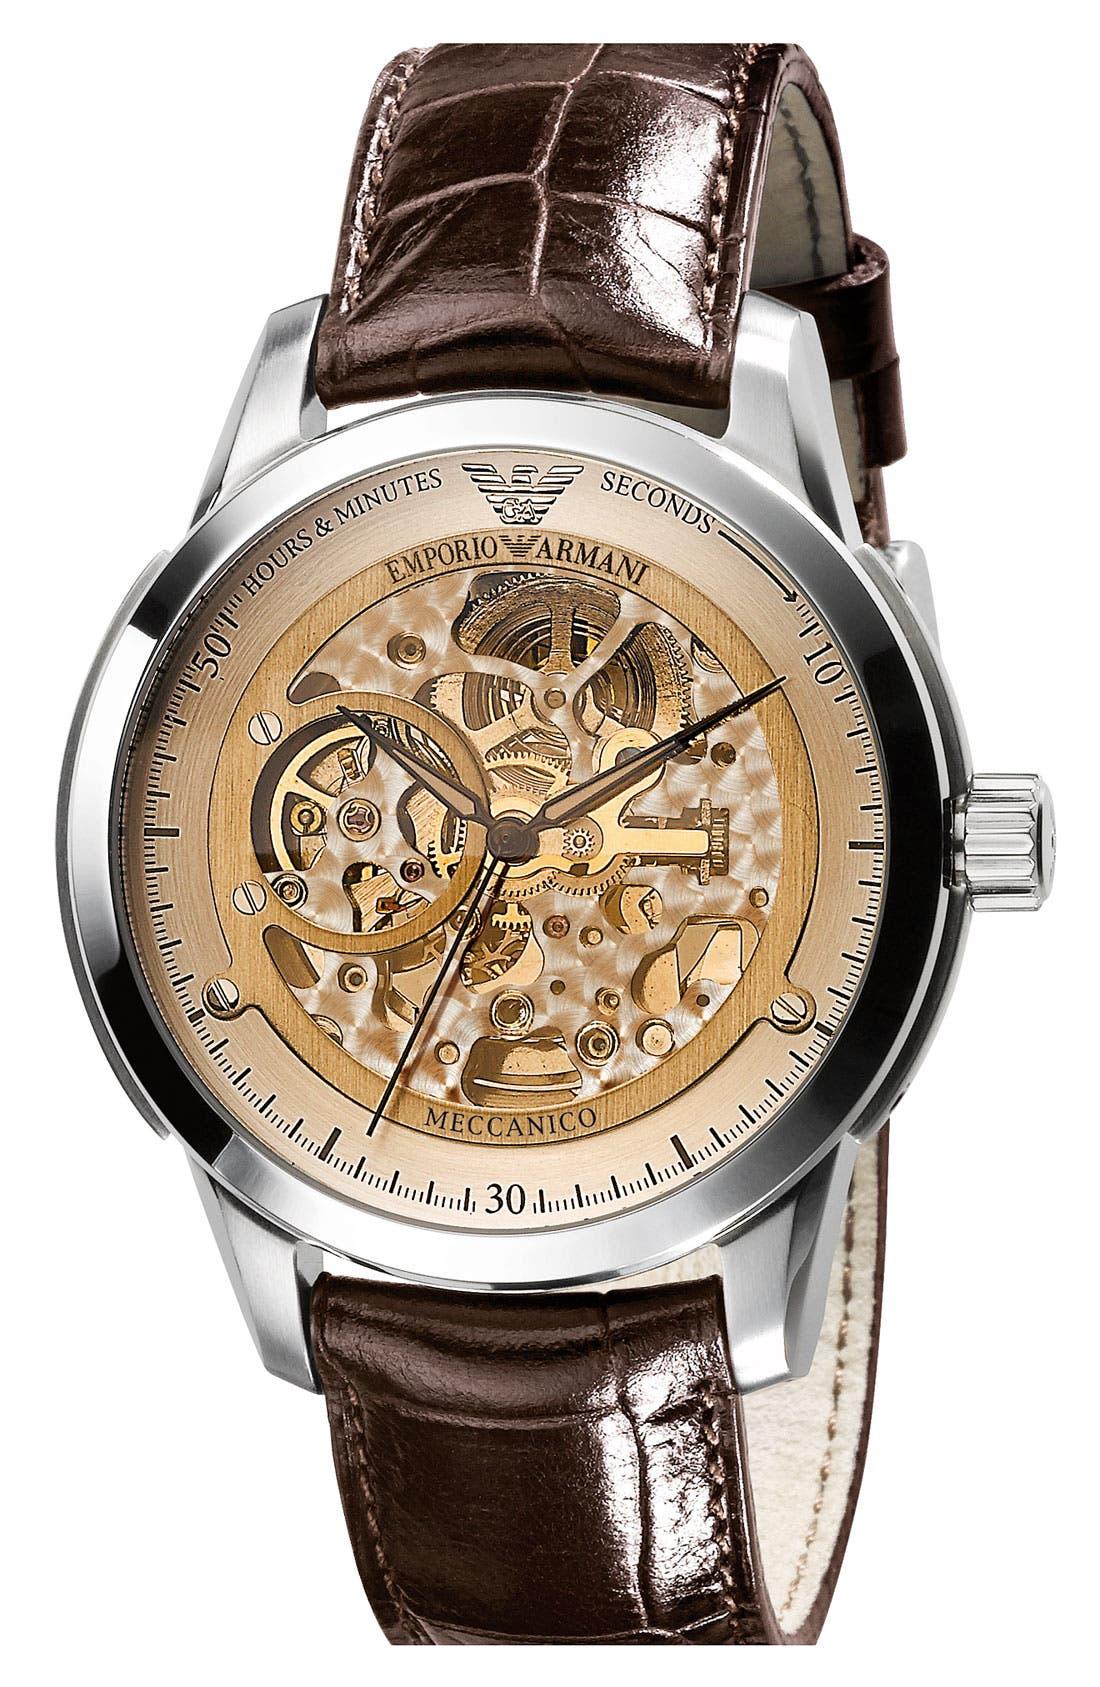 Main Image - Emporio Armani 'Meccanico' Automatic Round Watch